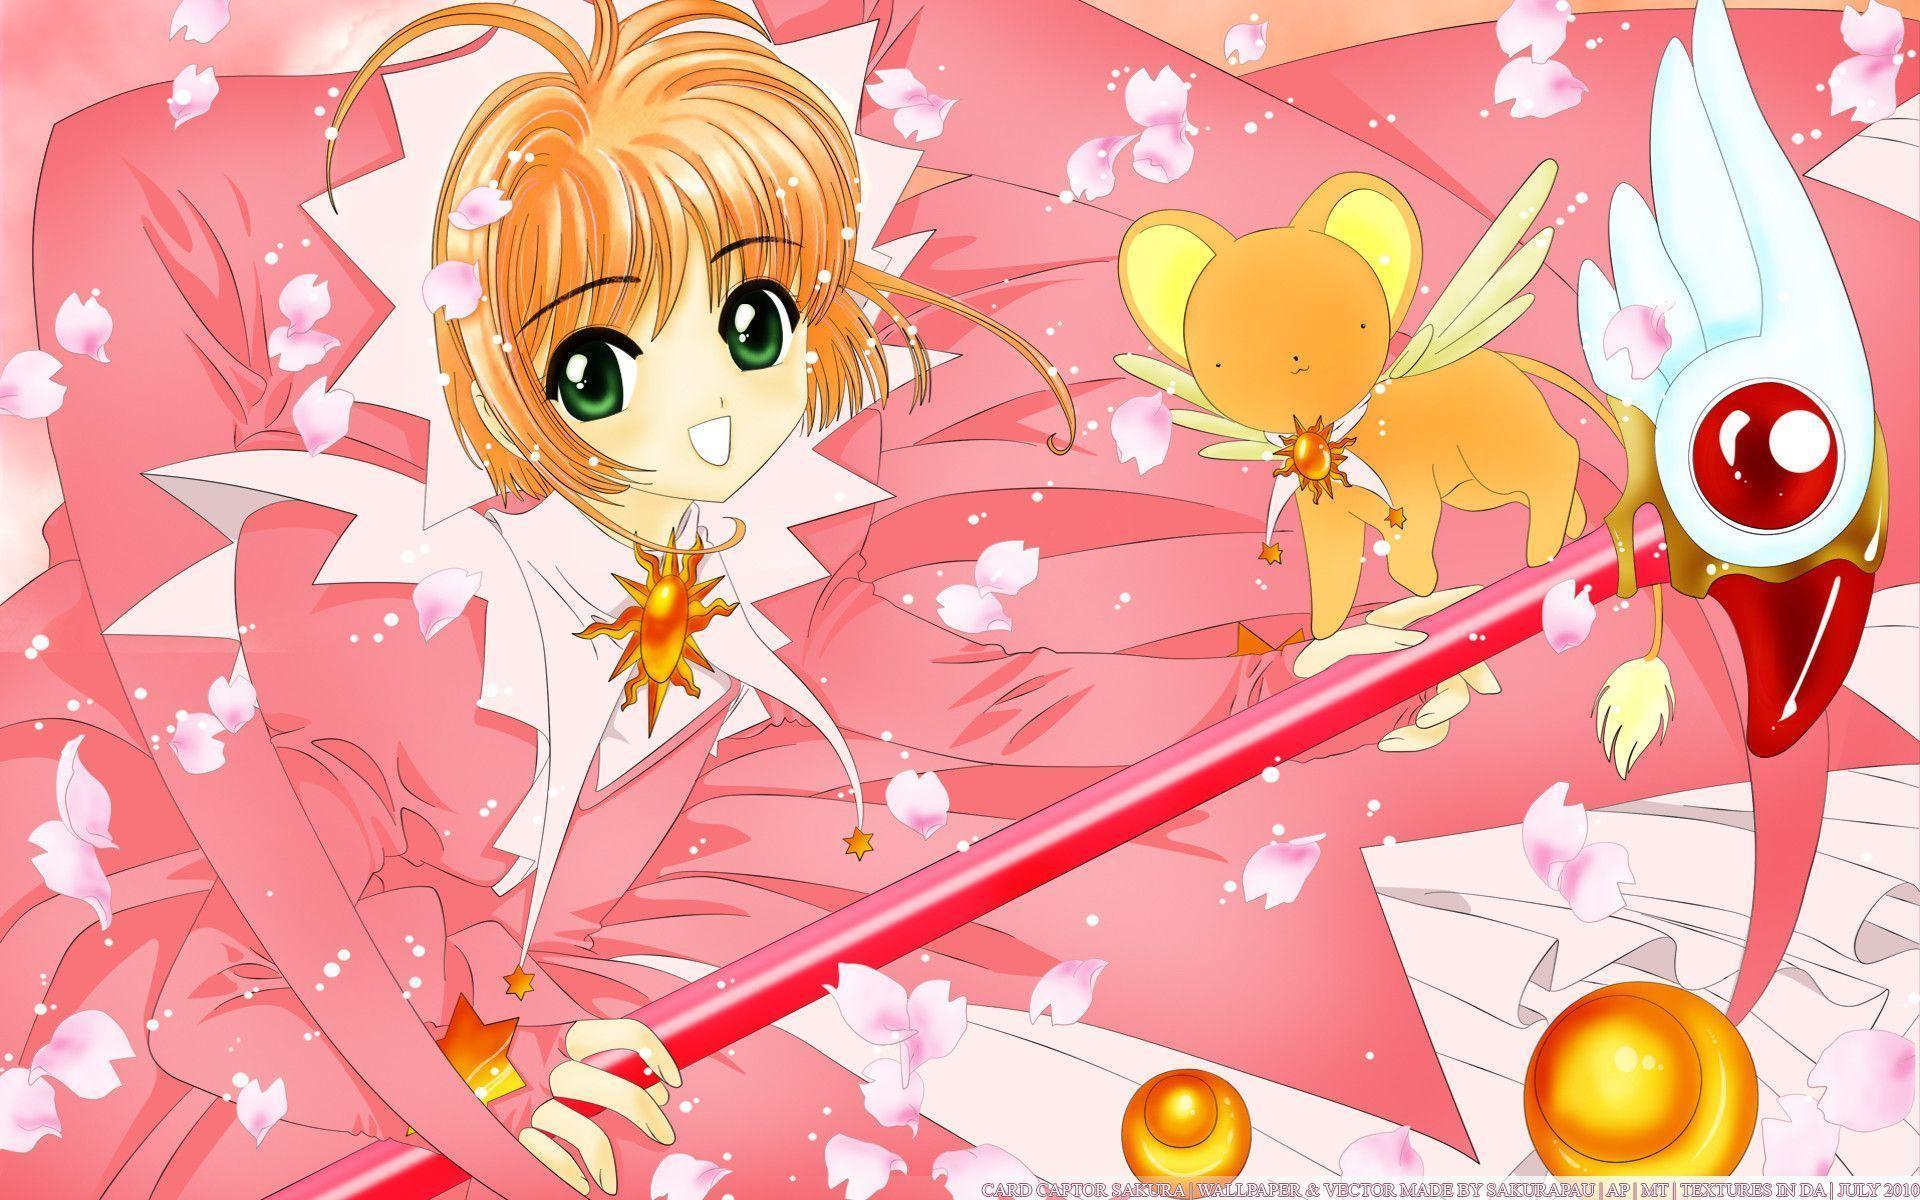 Cardcaptor sakura wallpapers wallpaper cave - Cardcaptor sakura wallpaper ...